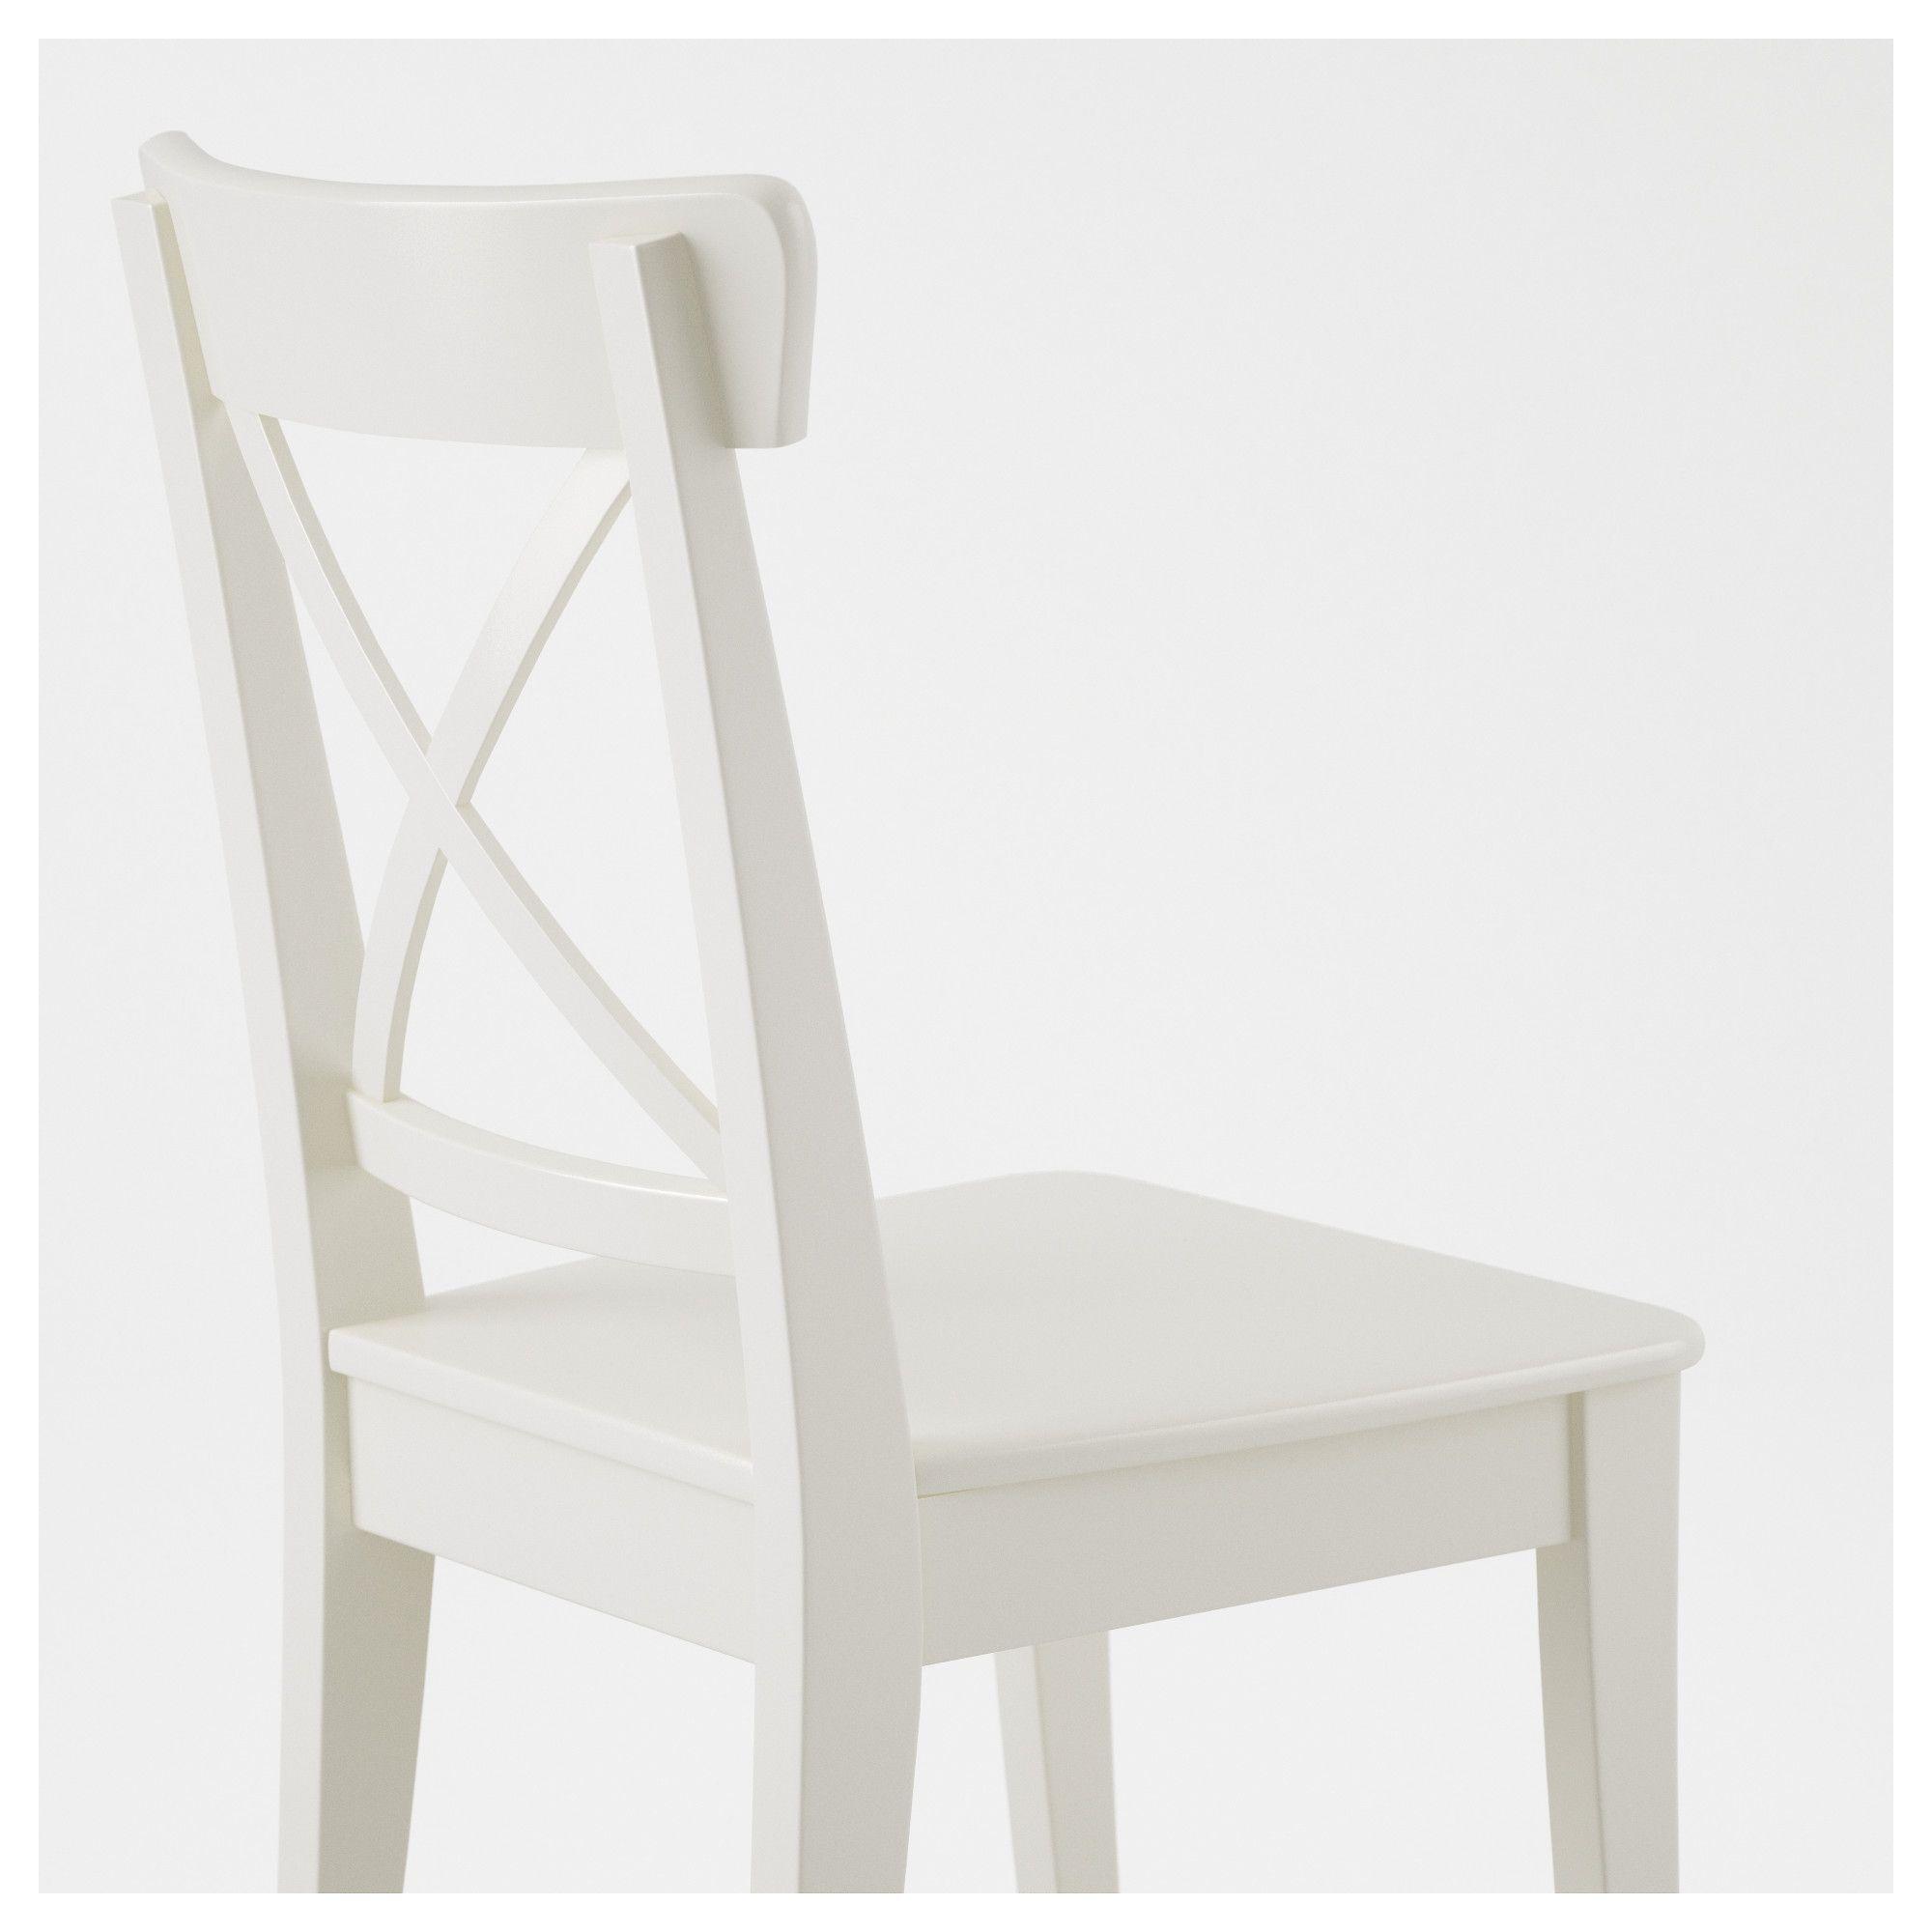 Ikea Esstisch Sessel   Test 6